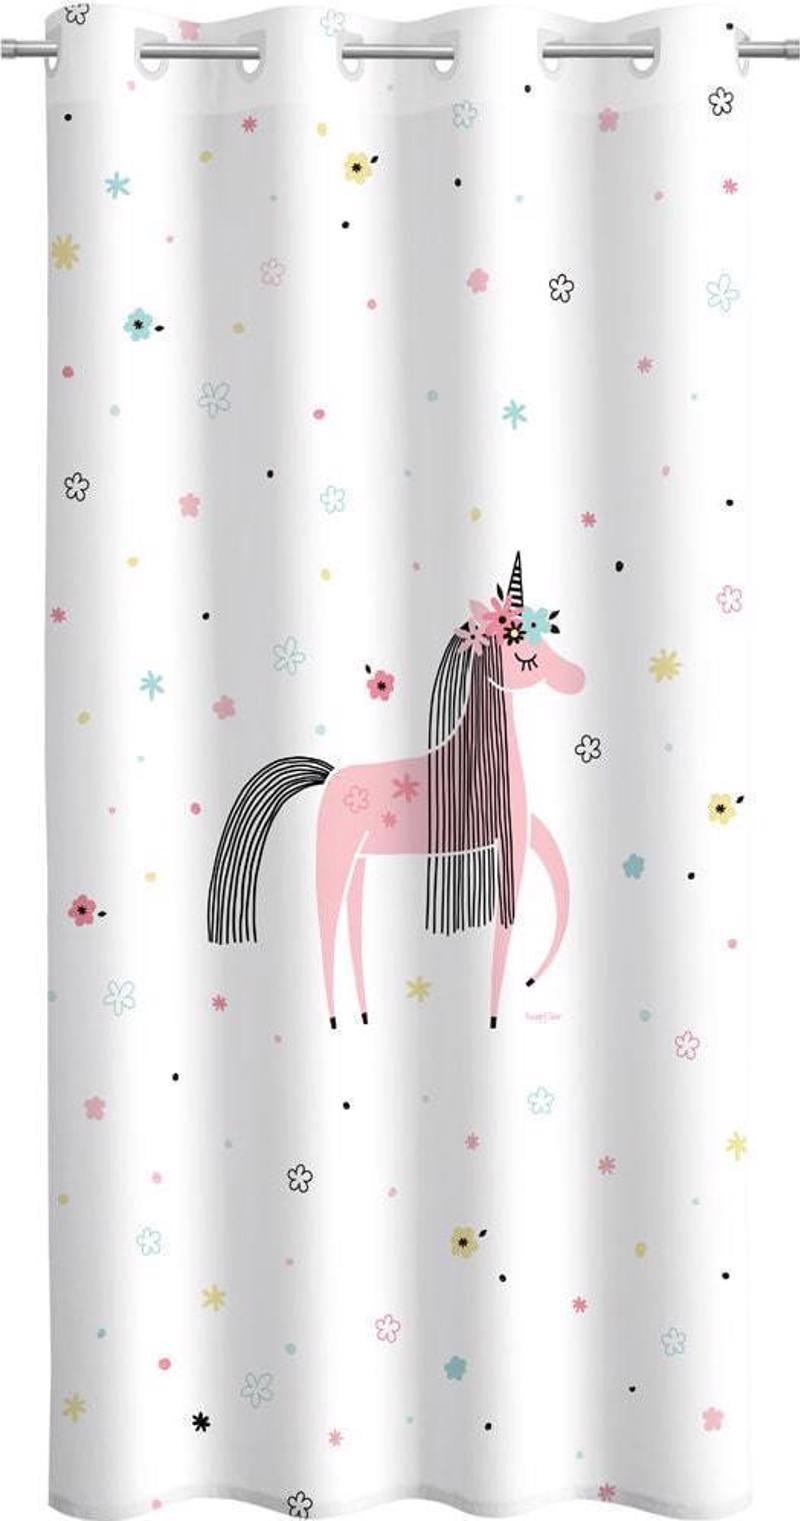 Saint Clair Κουρτίνα Unicorn 160×240